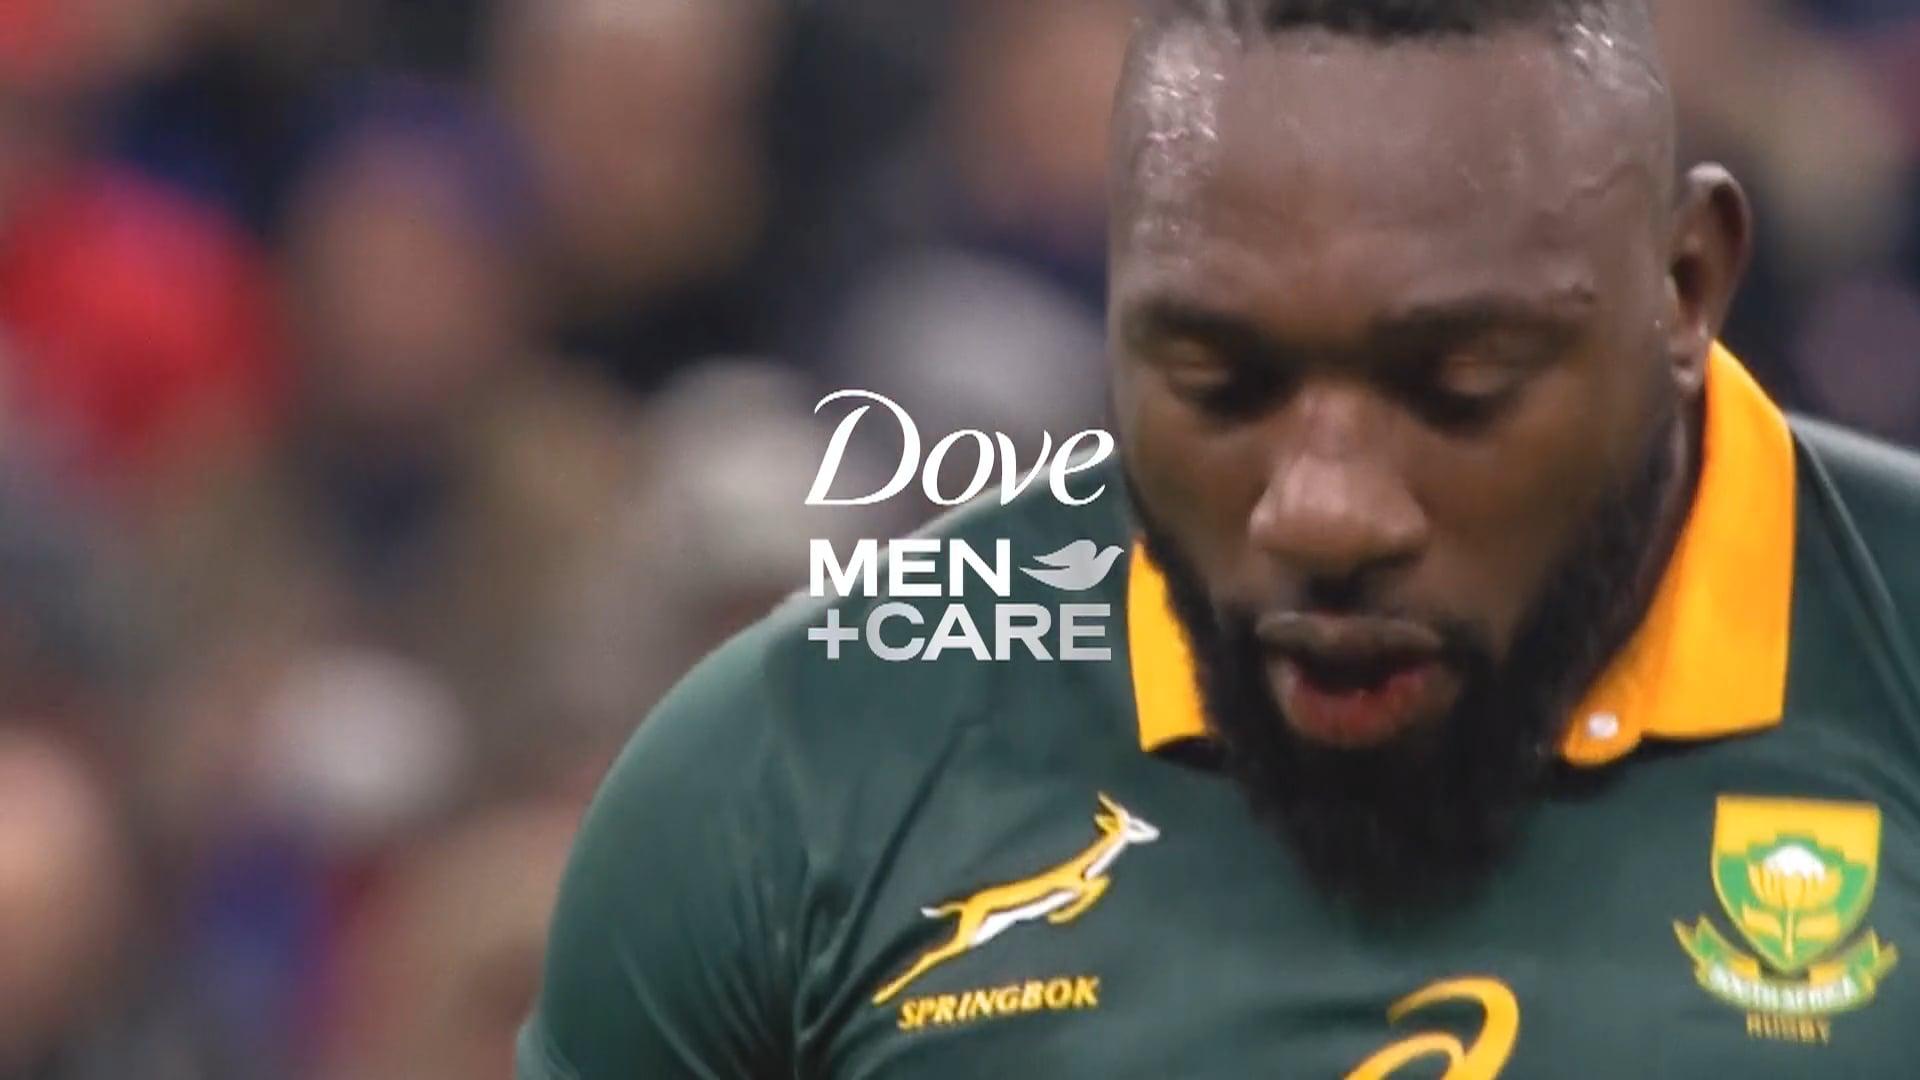 DOVE - A Tough Job - Tendai Mtawarira